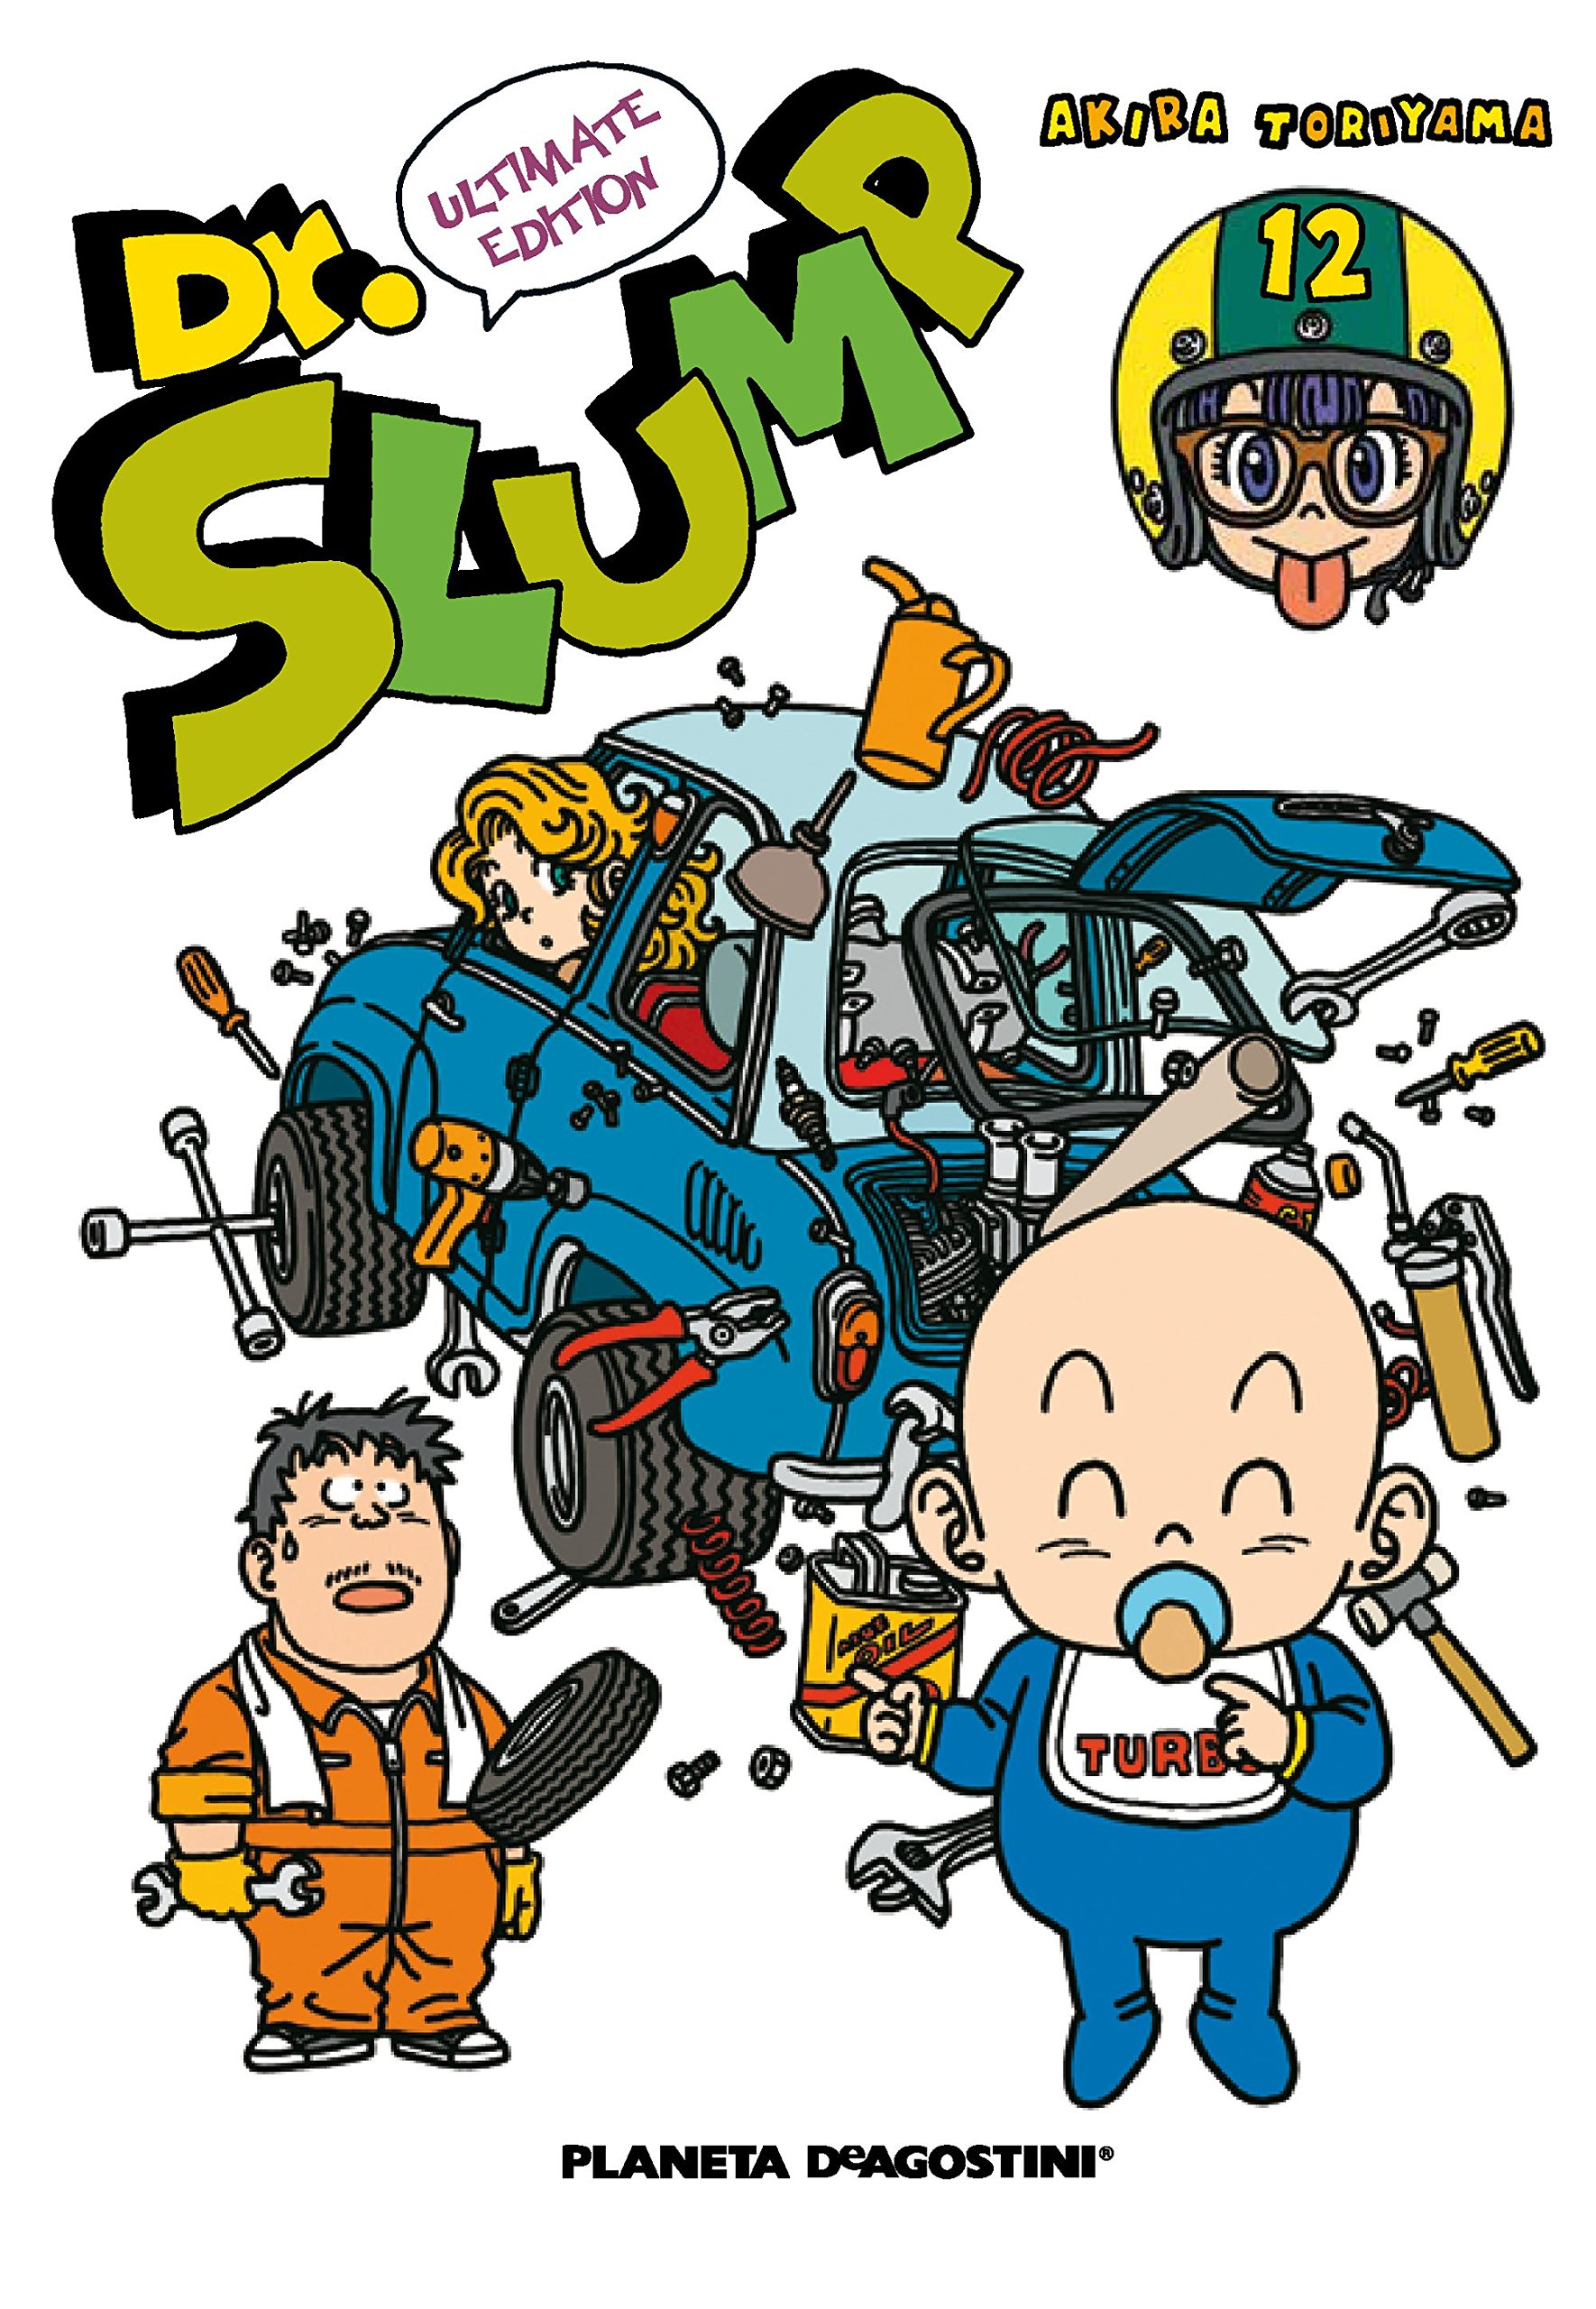 Dr. Slump nº 12/15 (Manga Shonen): Amazon.es: Toriyama, Akira: Libros